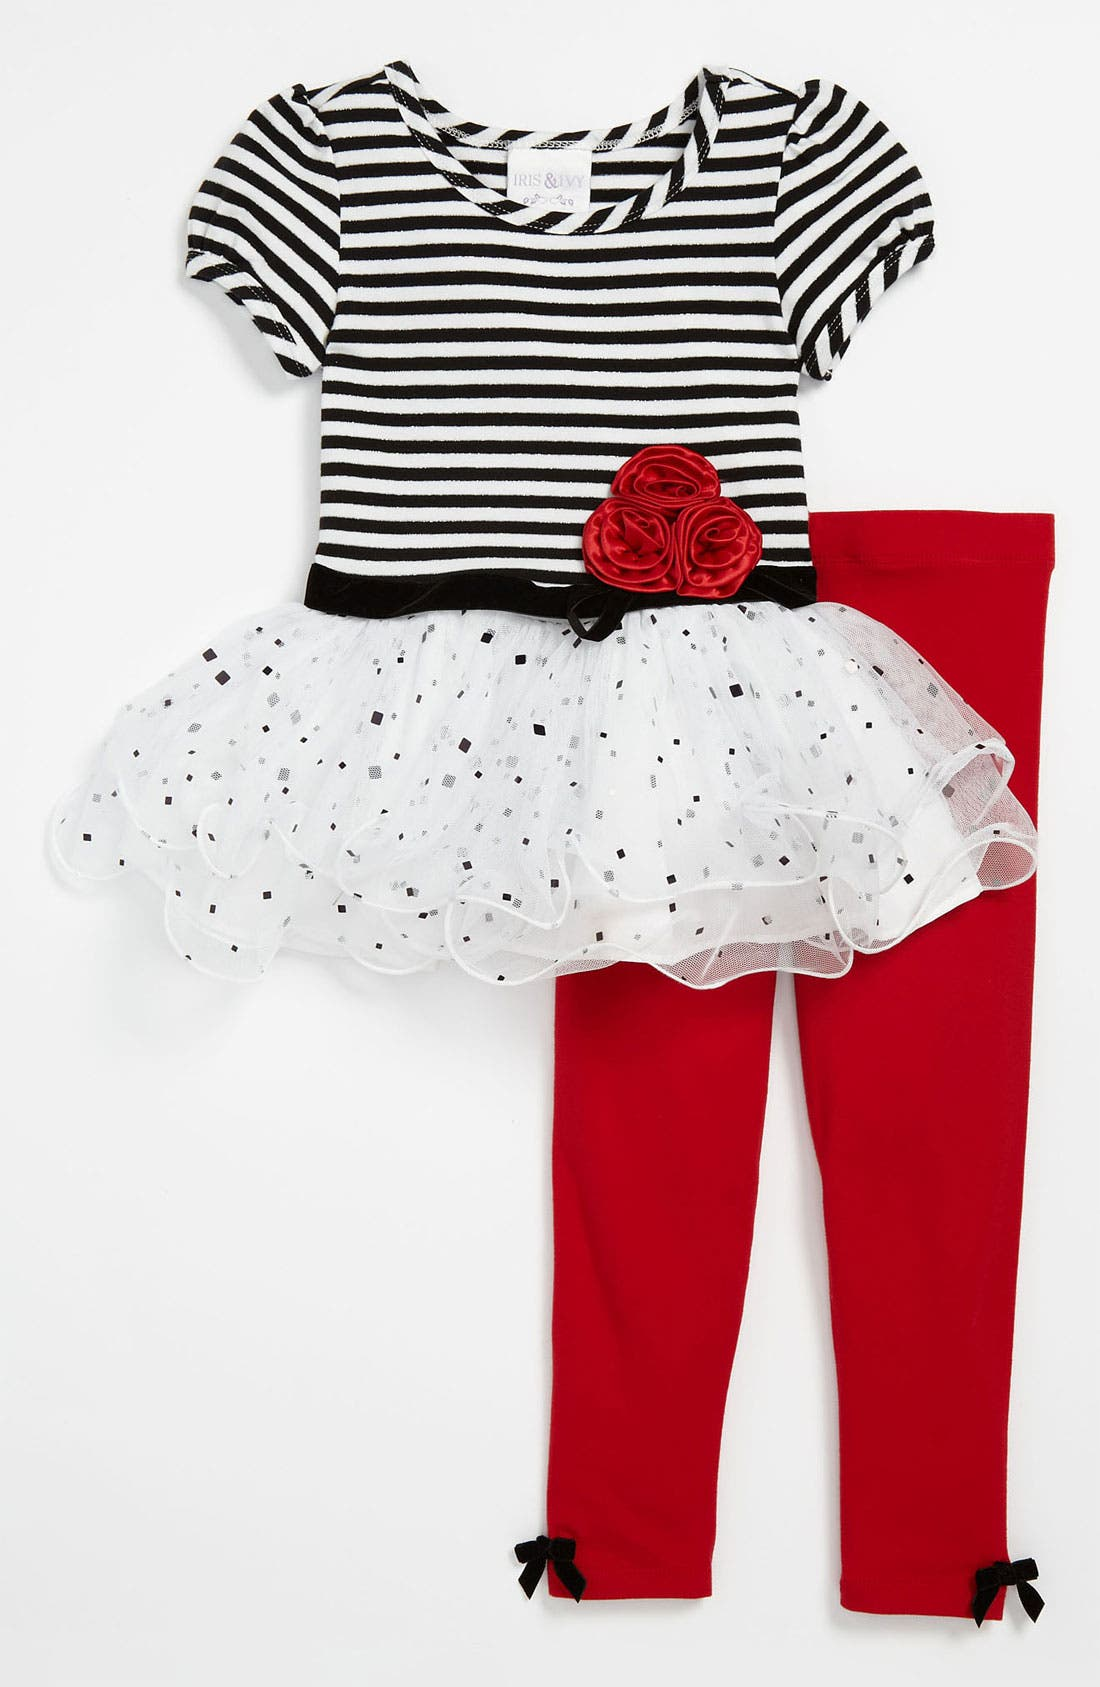 Alternate Image 1 Selected - Iris & Ivy Stripe Dress & Leggings (Infant)